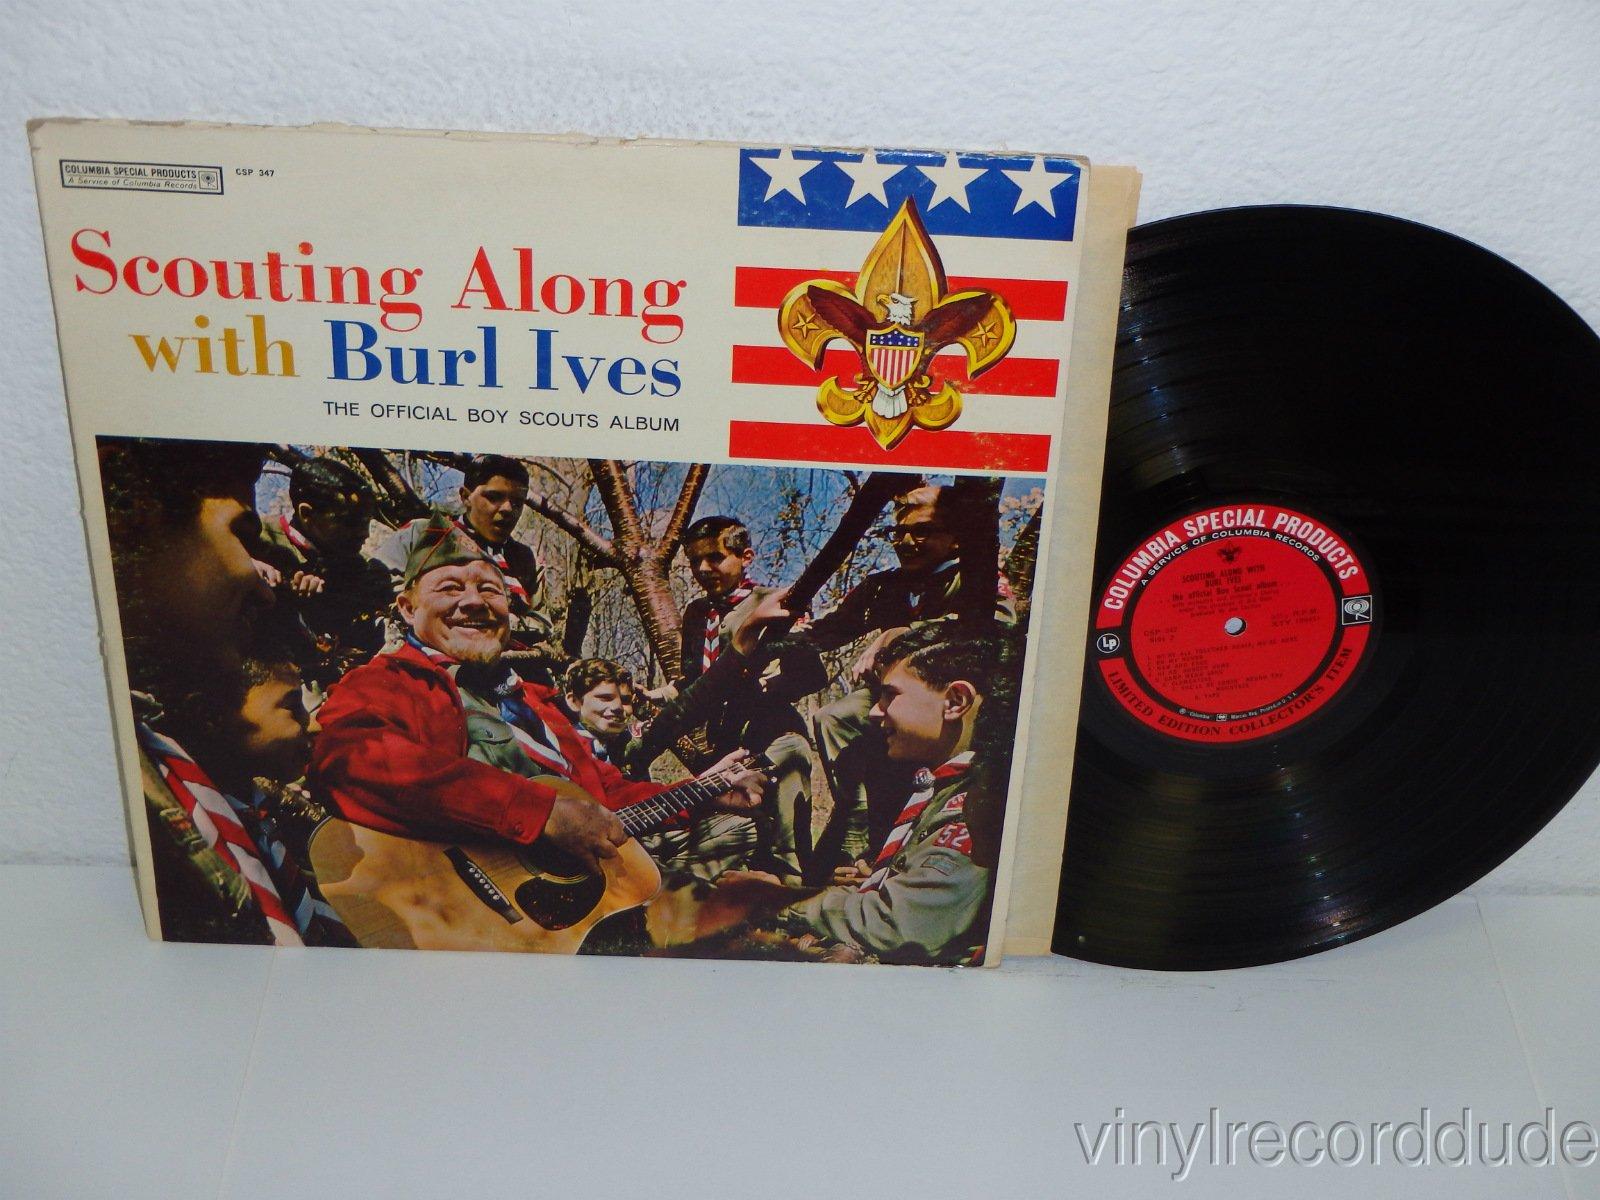 Scouting Along With Burl Ives: The Official Boy Scouts Album [Vinyl LP]